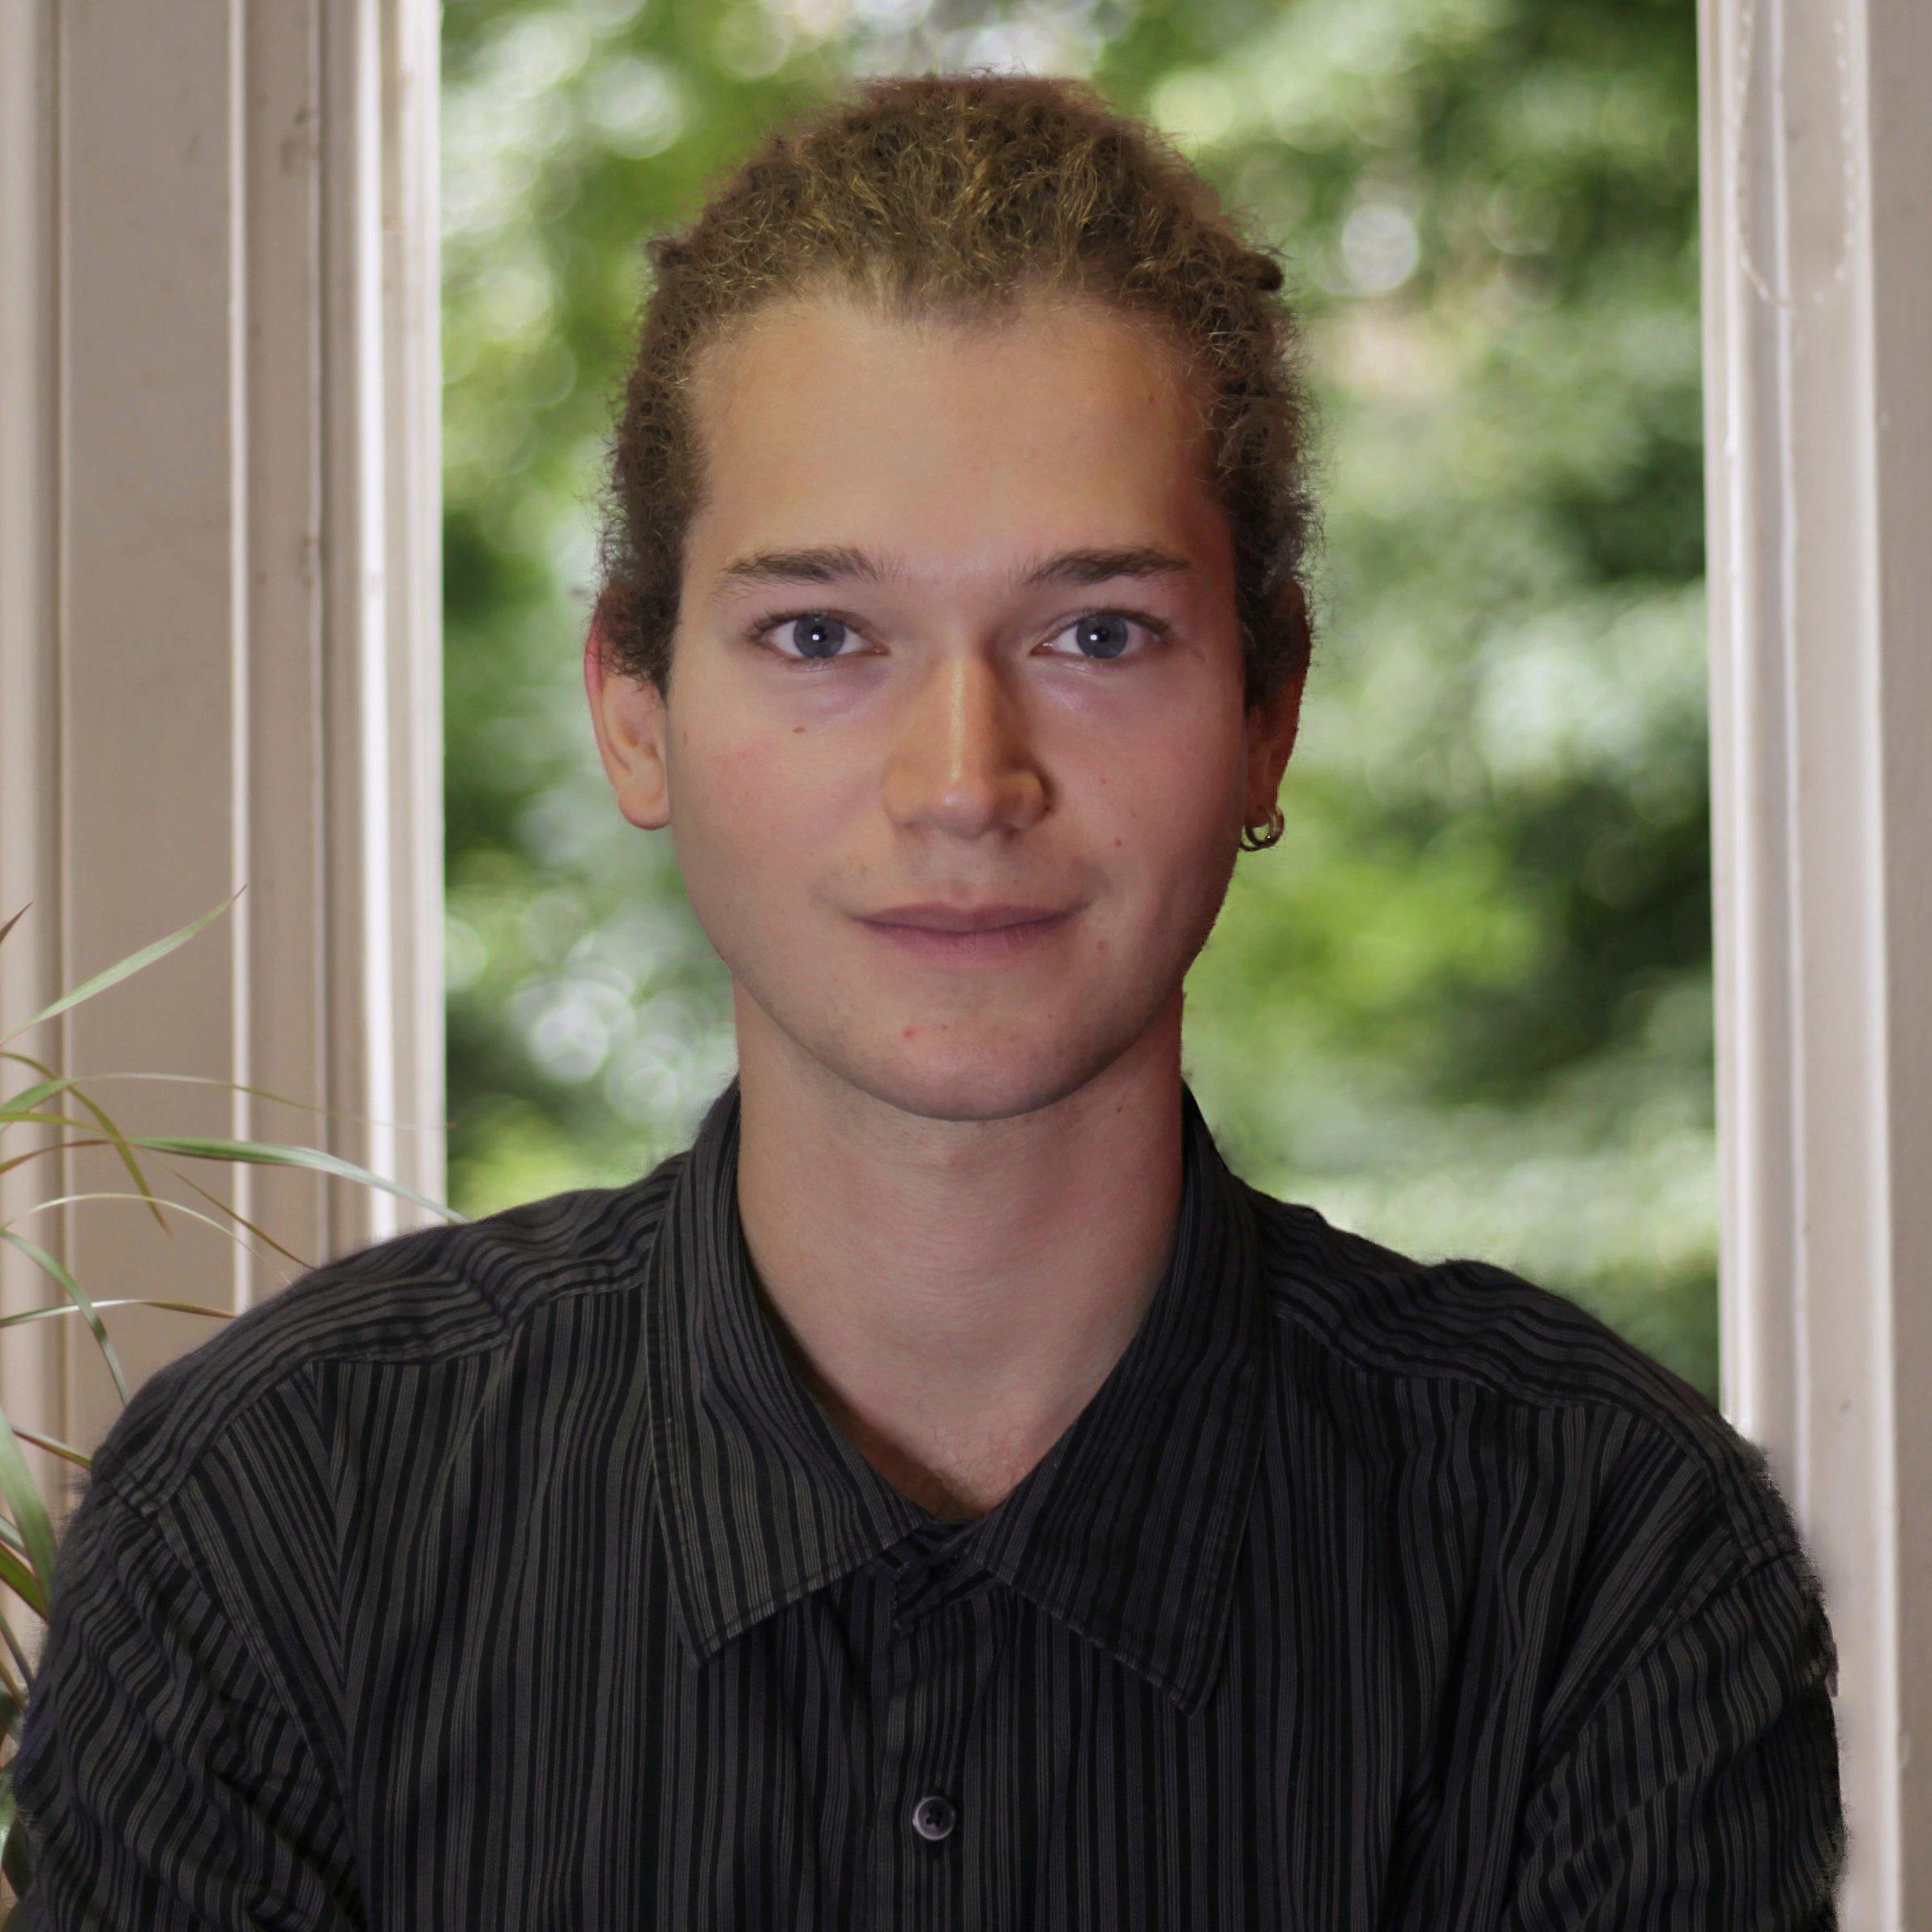 Daniel Photo